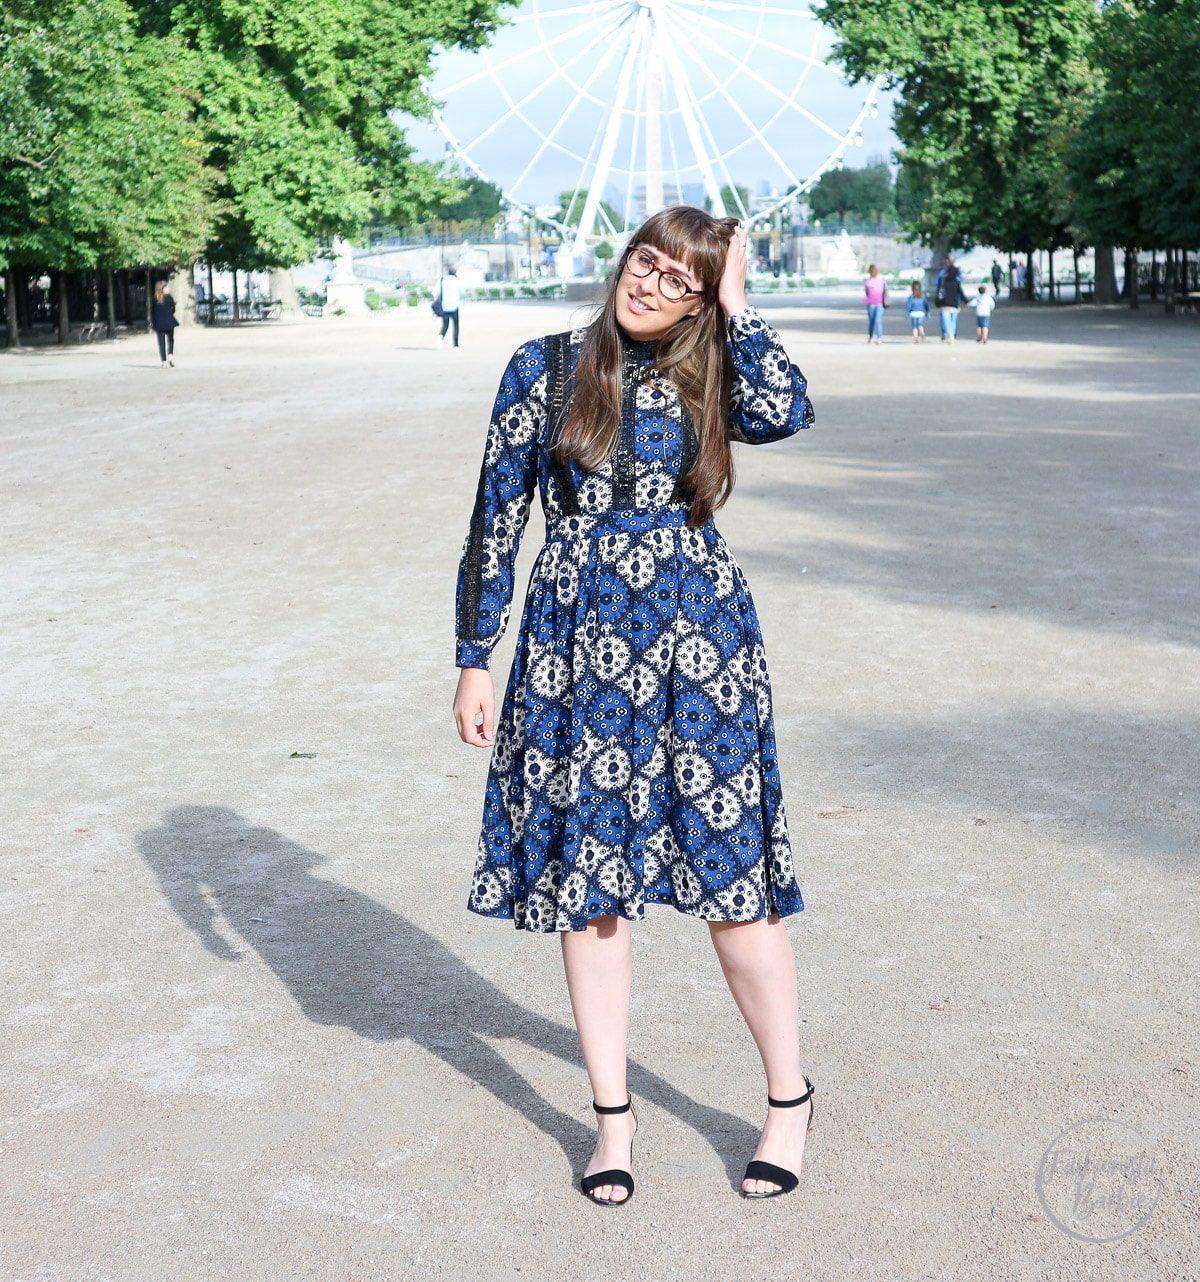 Parisian Boohoo Style Under £20